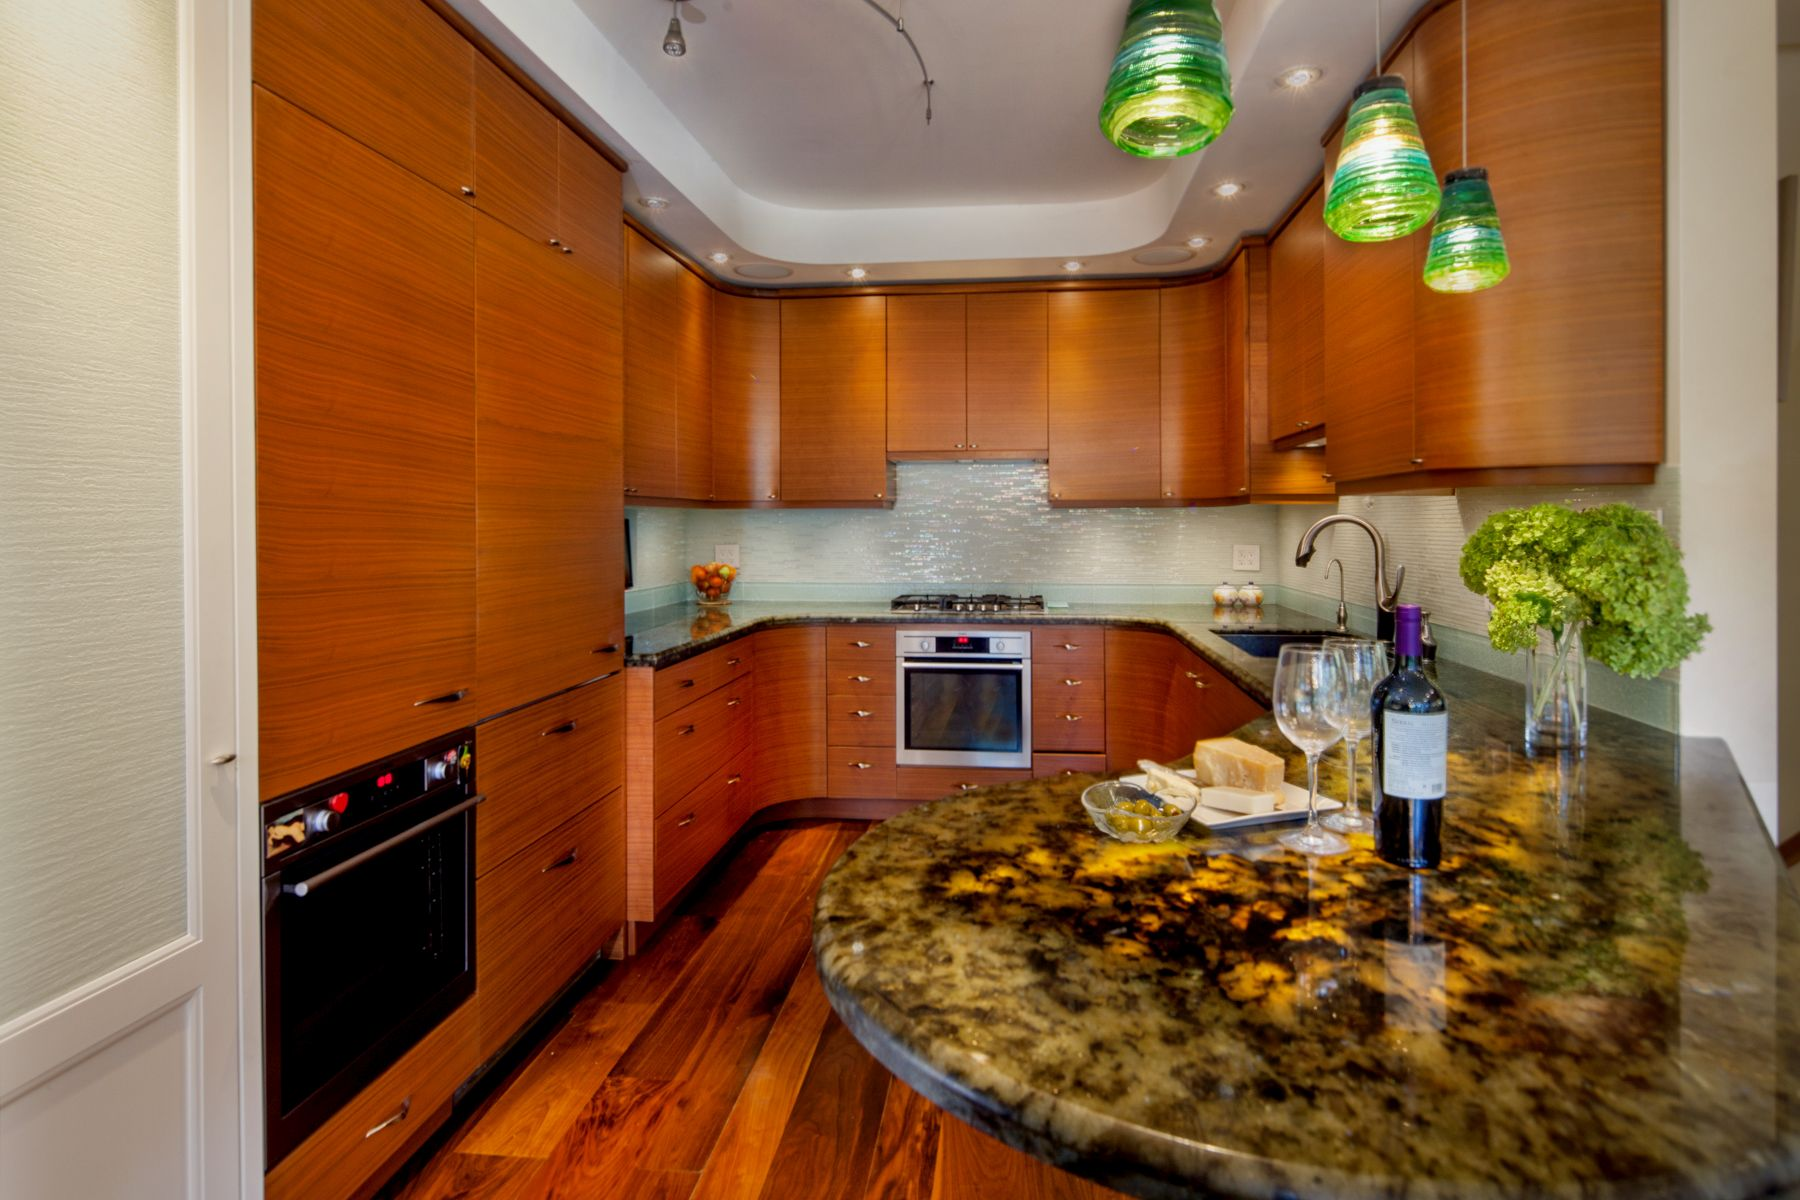 kewbeachouse kitchen